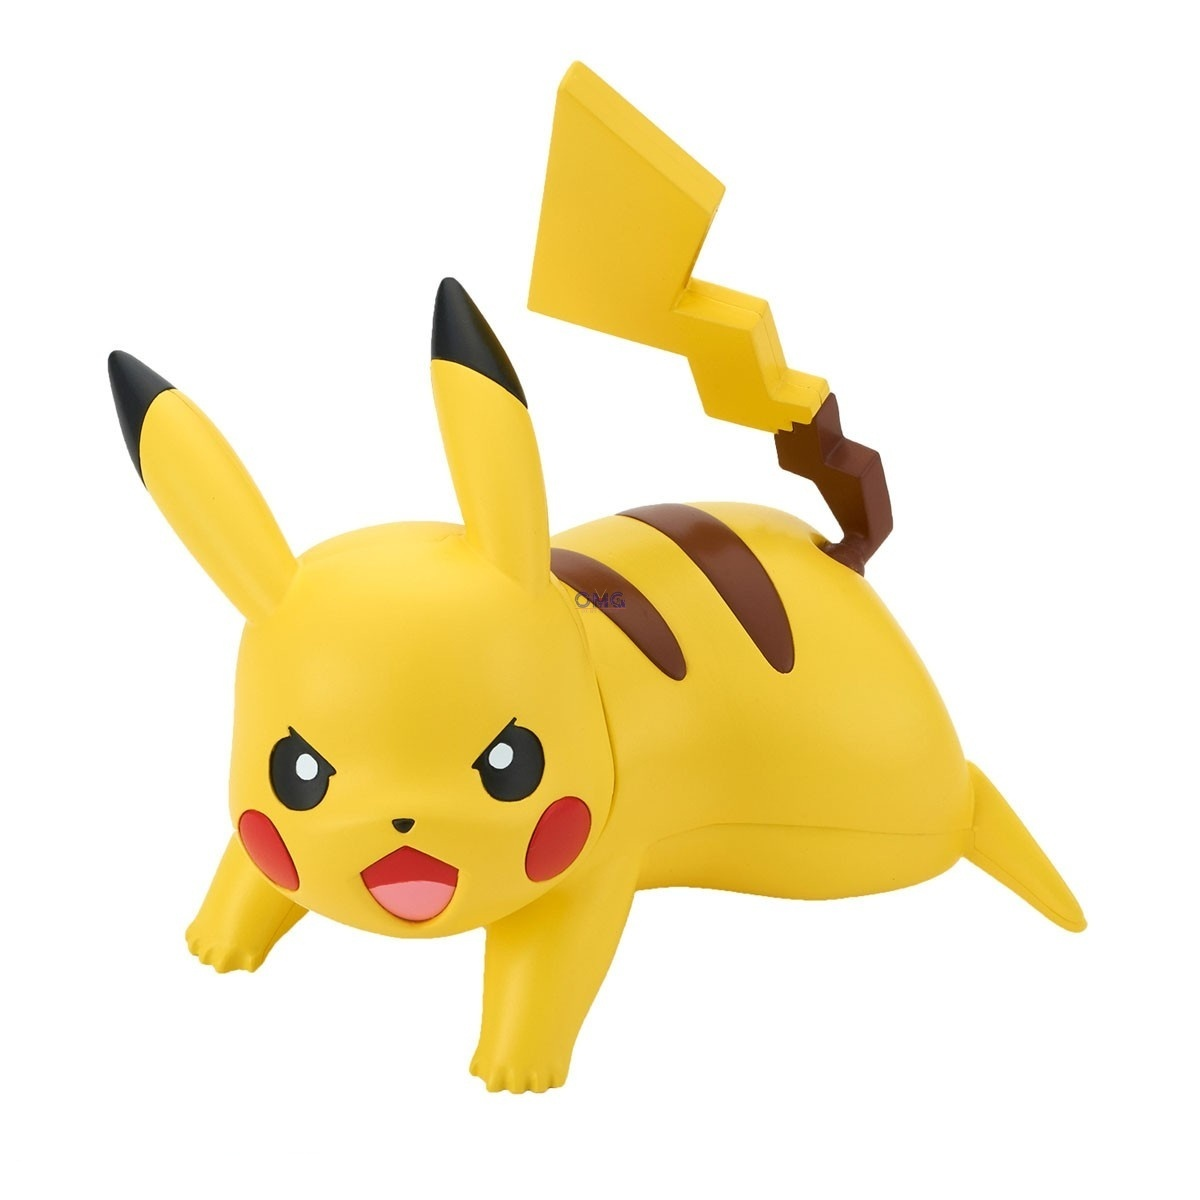 Bandai Pokemon Plastic Model Collection Quick!! 03 Pikachu 1.0.jpg